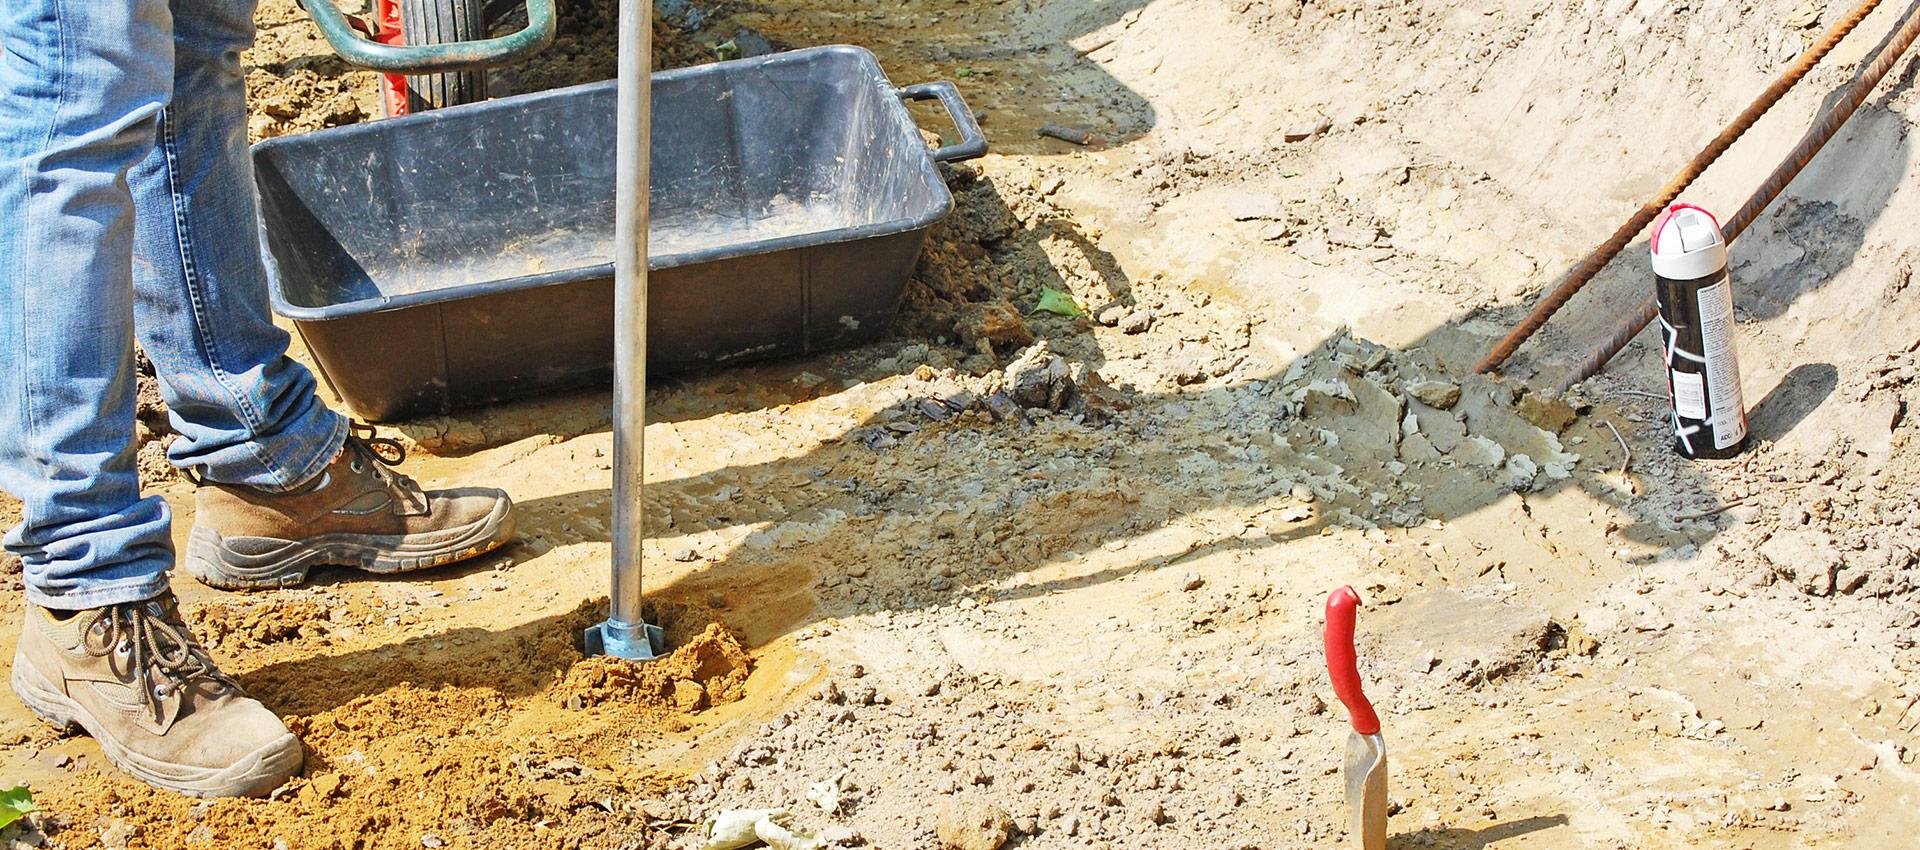 ingegneria-carotaggio-terreno-ambiente